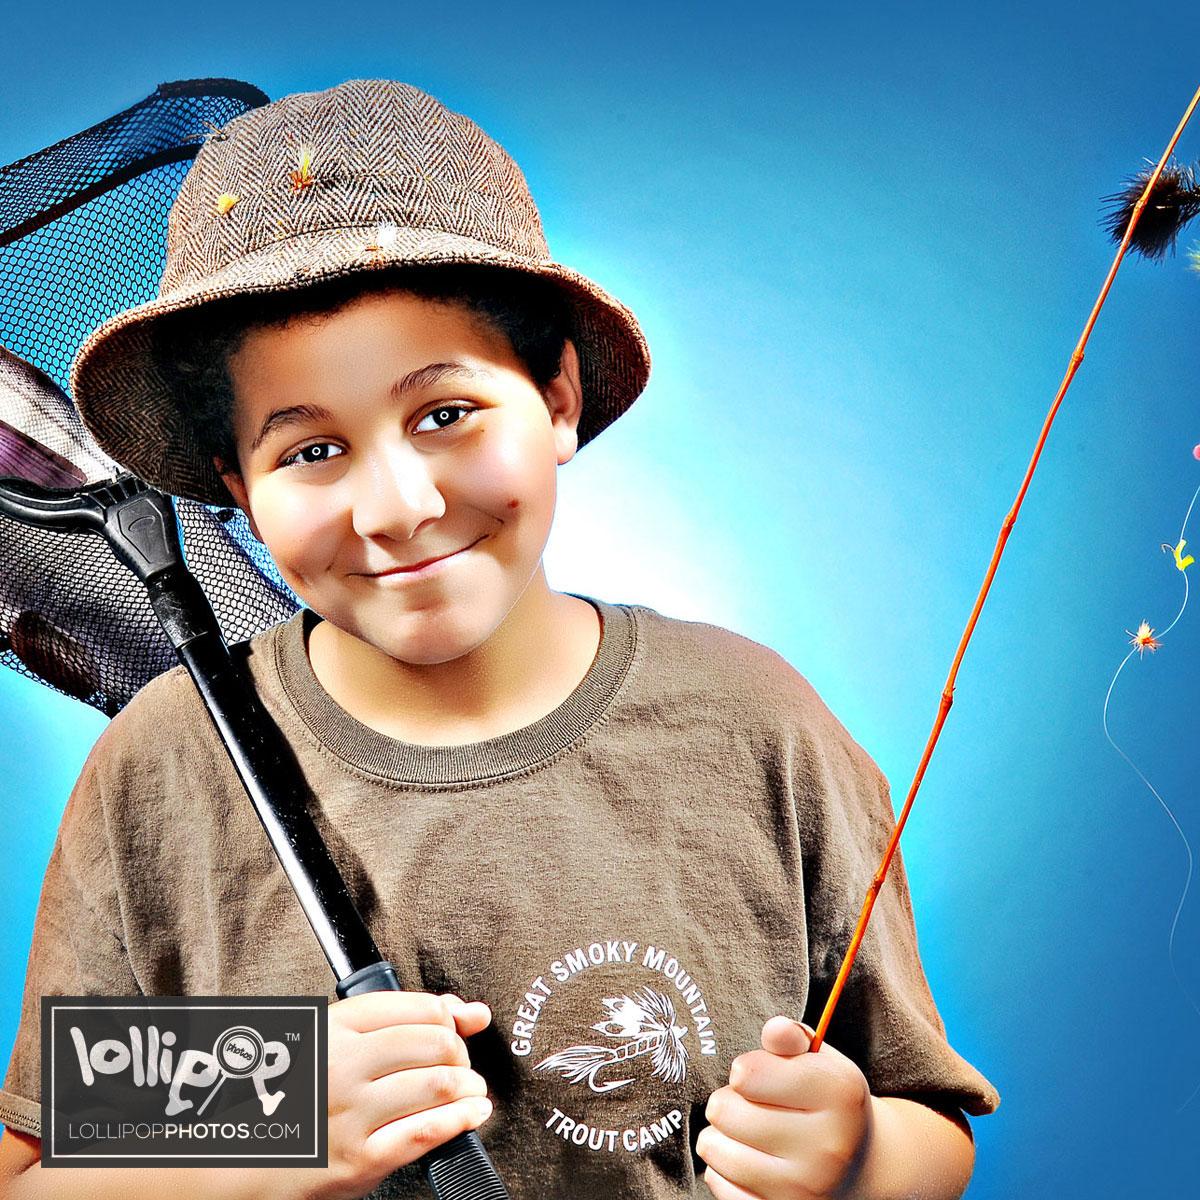 msdig-nora-canfield-lollipop-photos-593.jpg